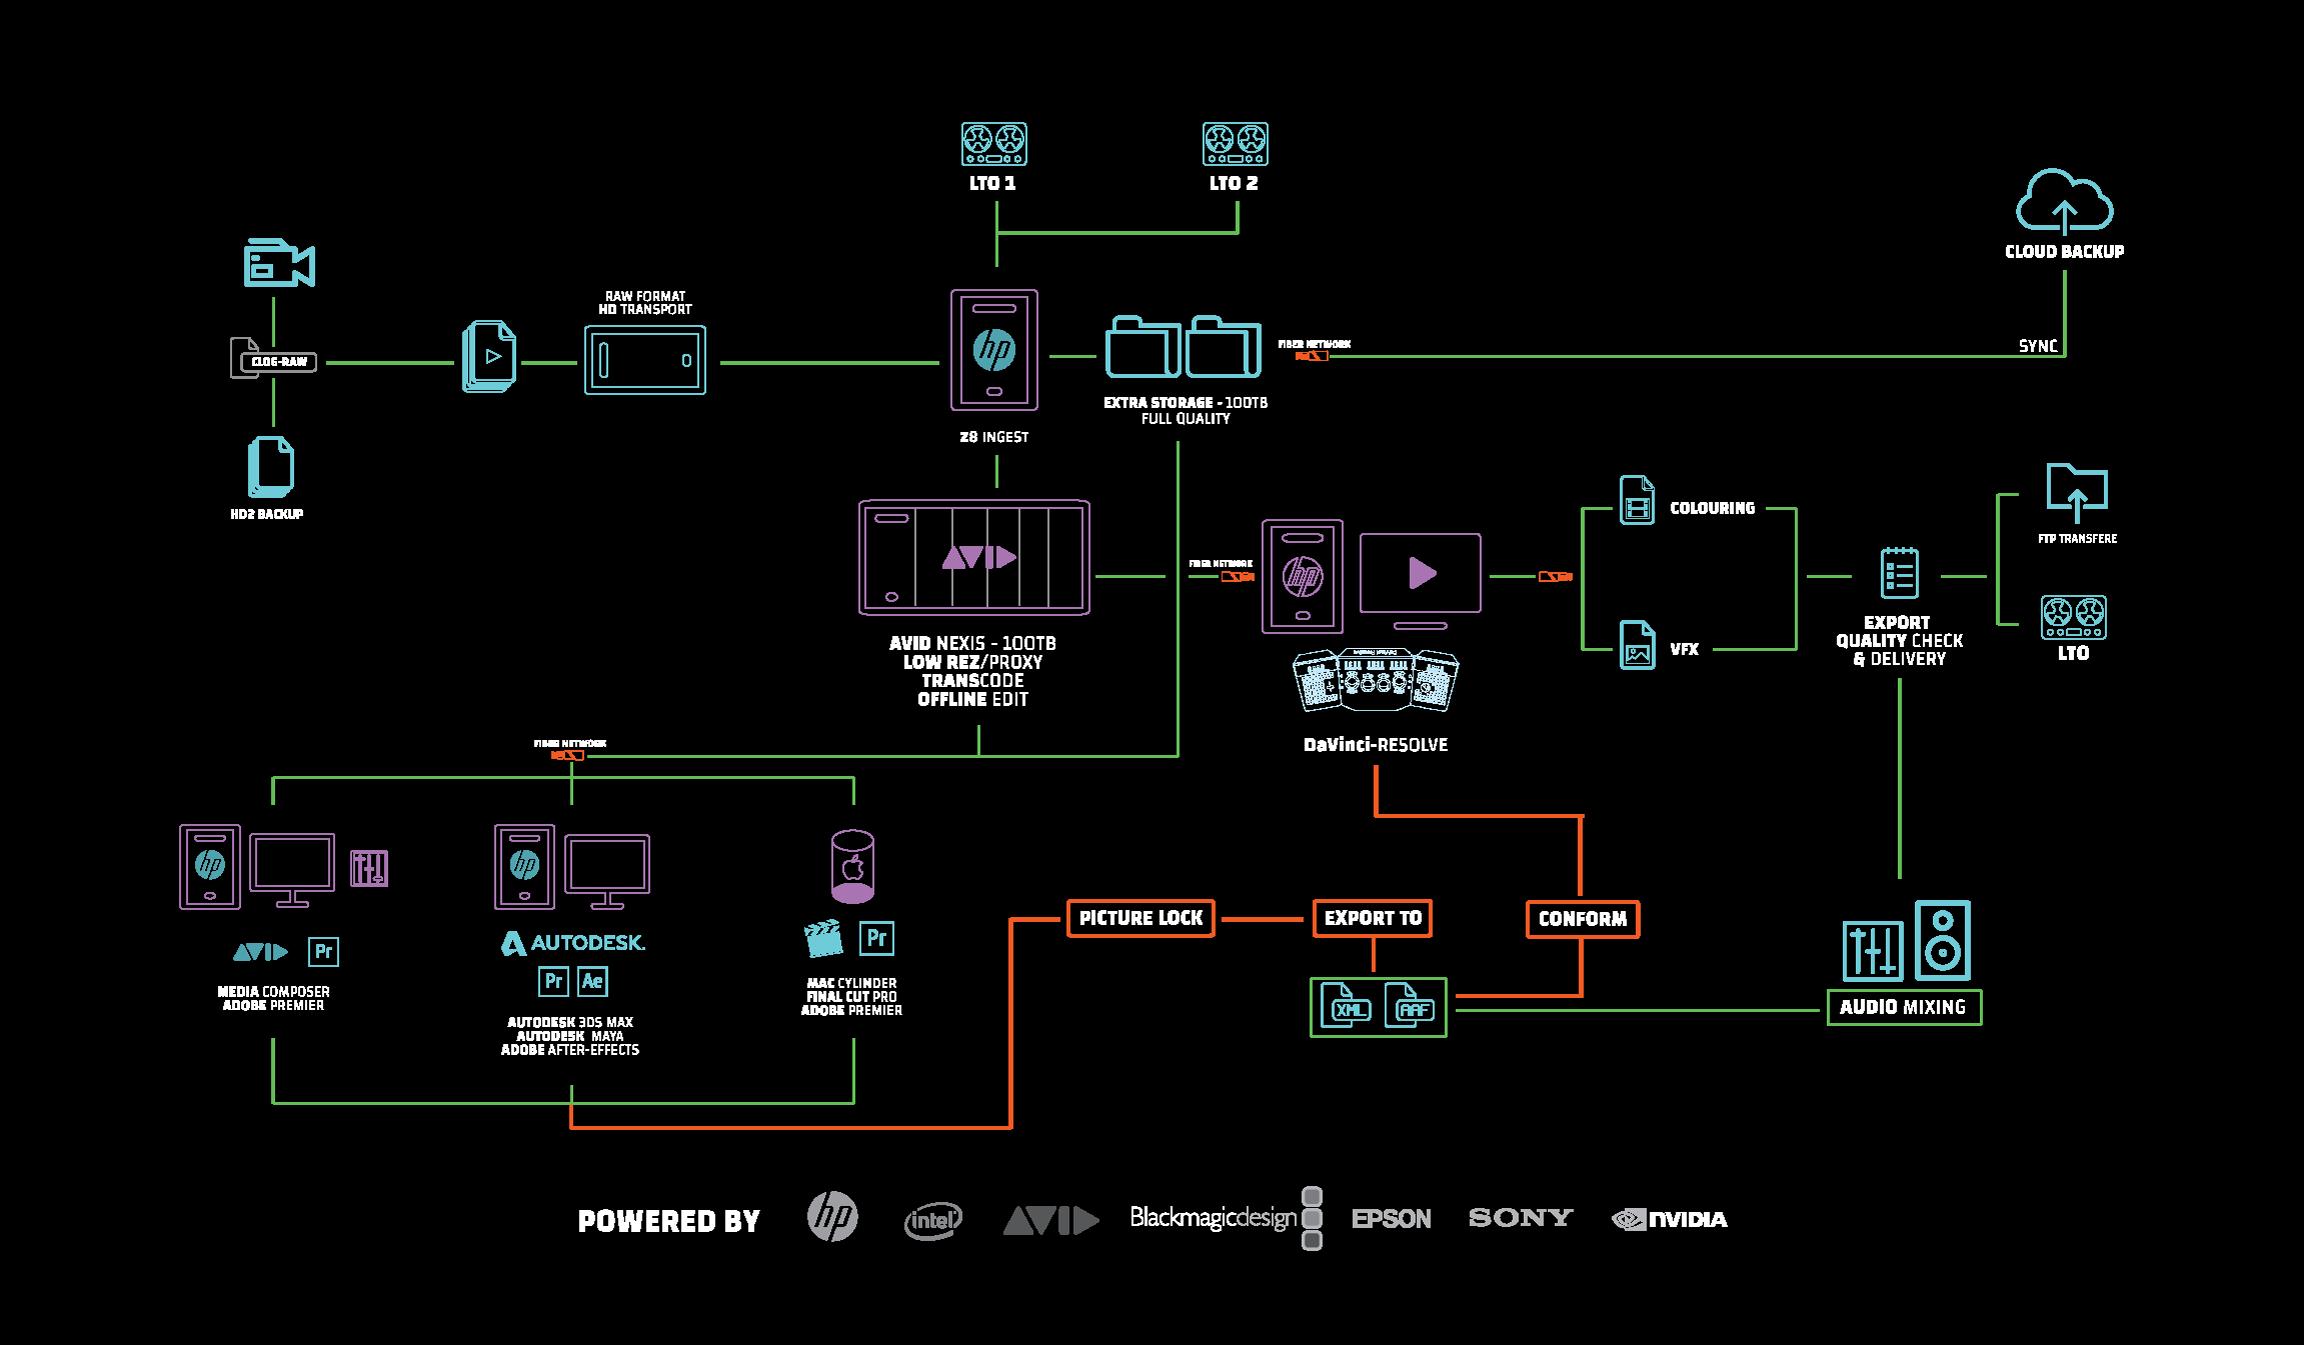 RUM Pictures workflow